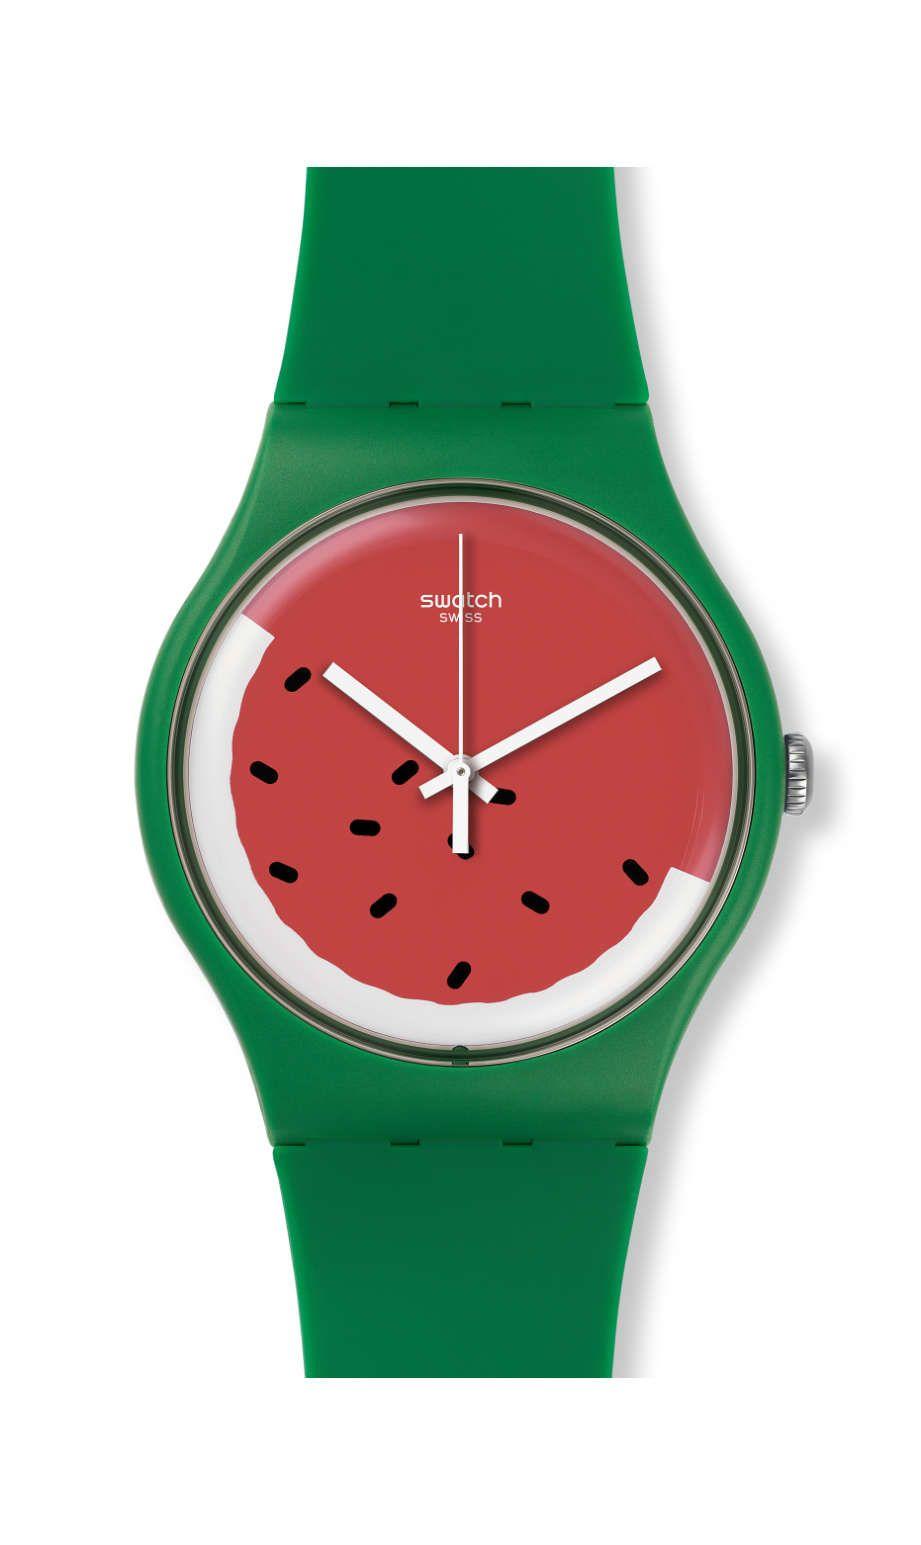 6885e6e0ae67 PASTEQUE Swatch Watch Swatch